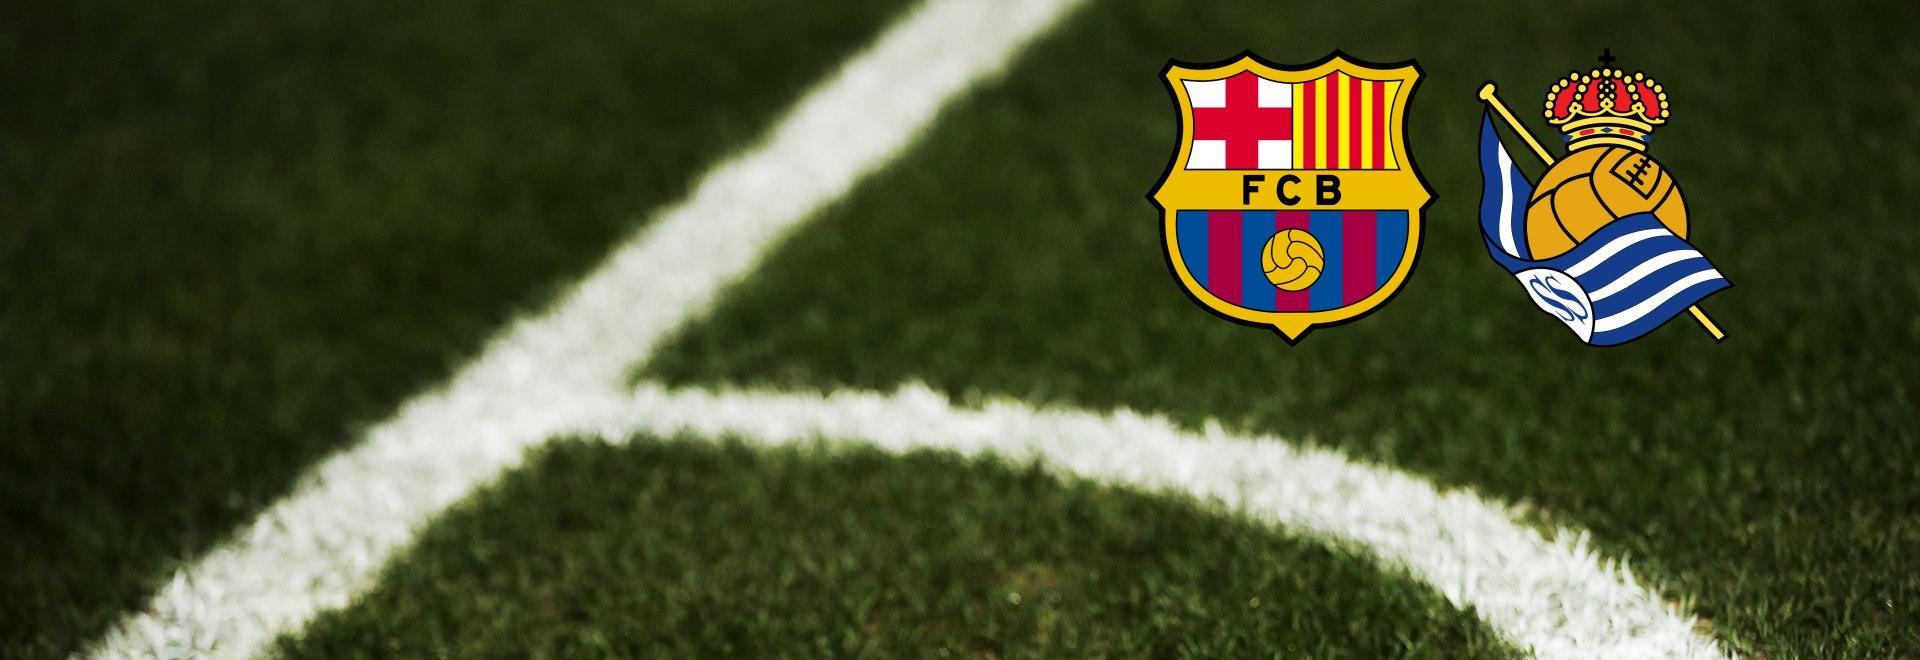 Barcellona - Real Sociedad. 27a g.